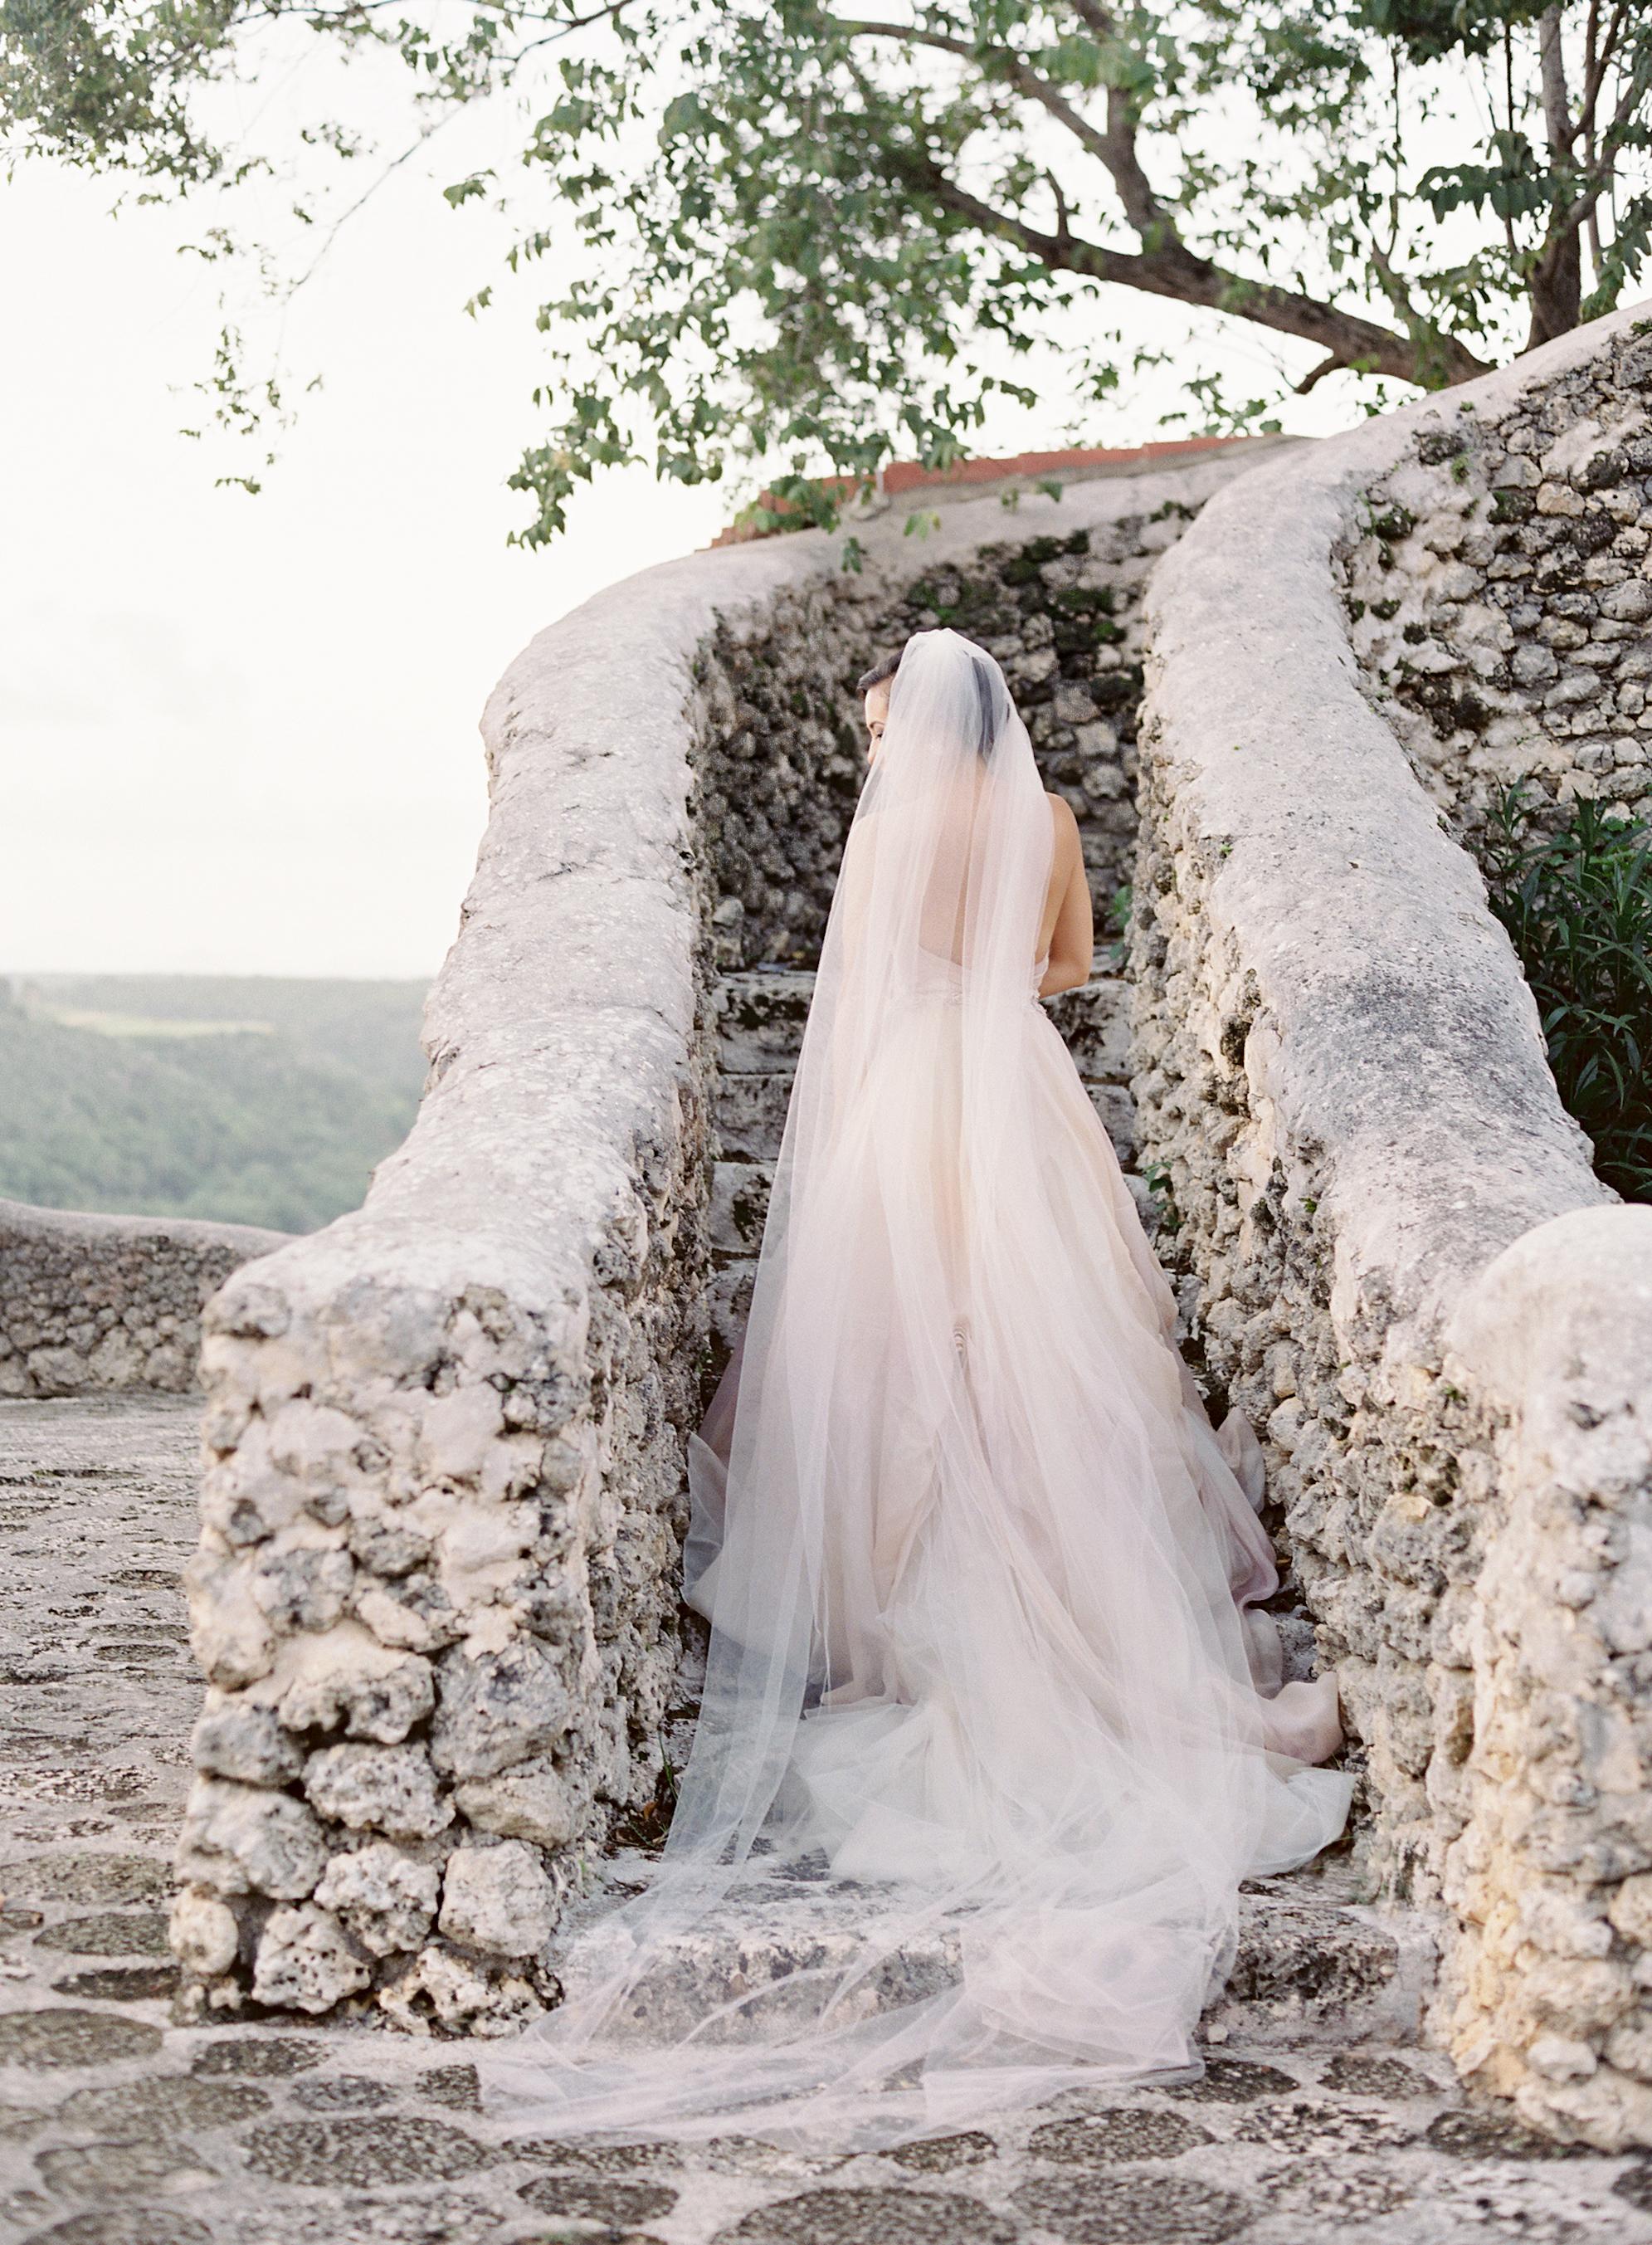 Ashleigh and Brian-Wedding Day-Carrie King Photographer-461.jpg